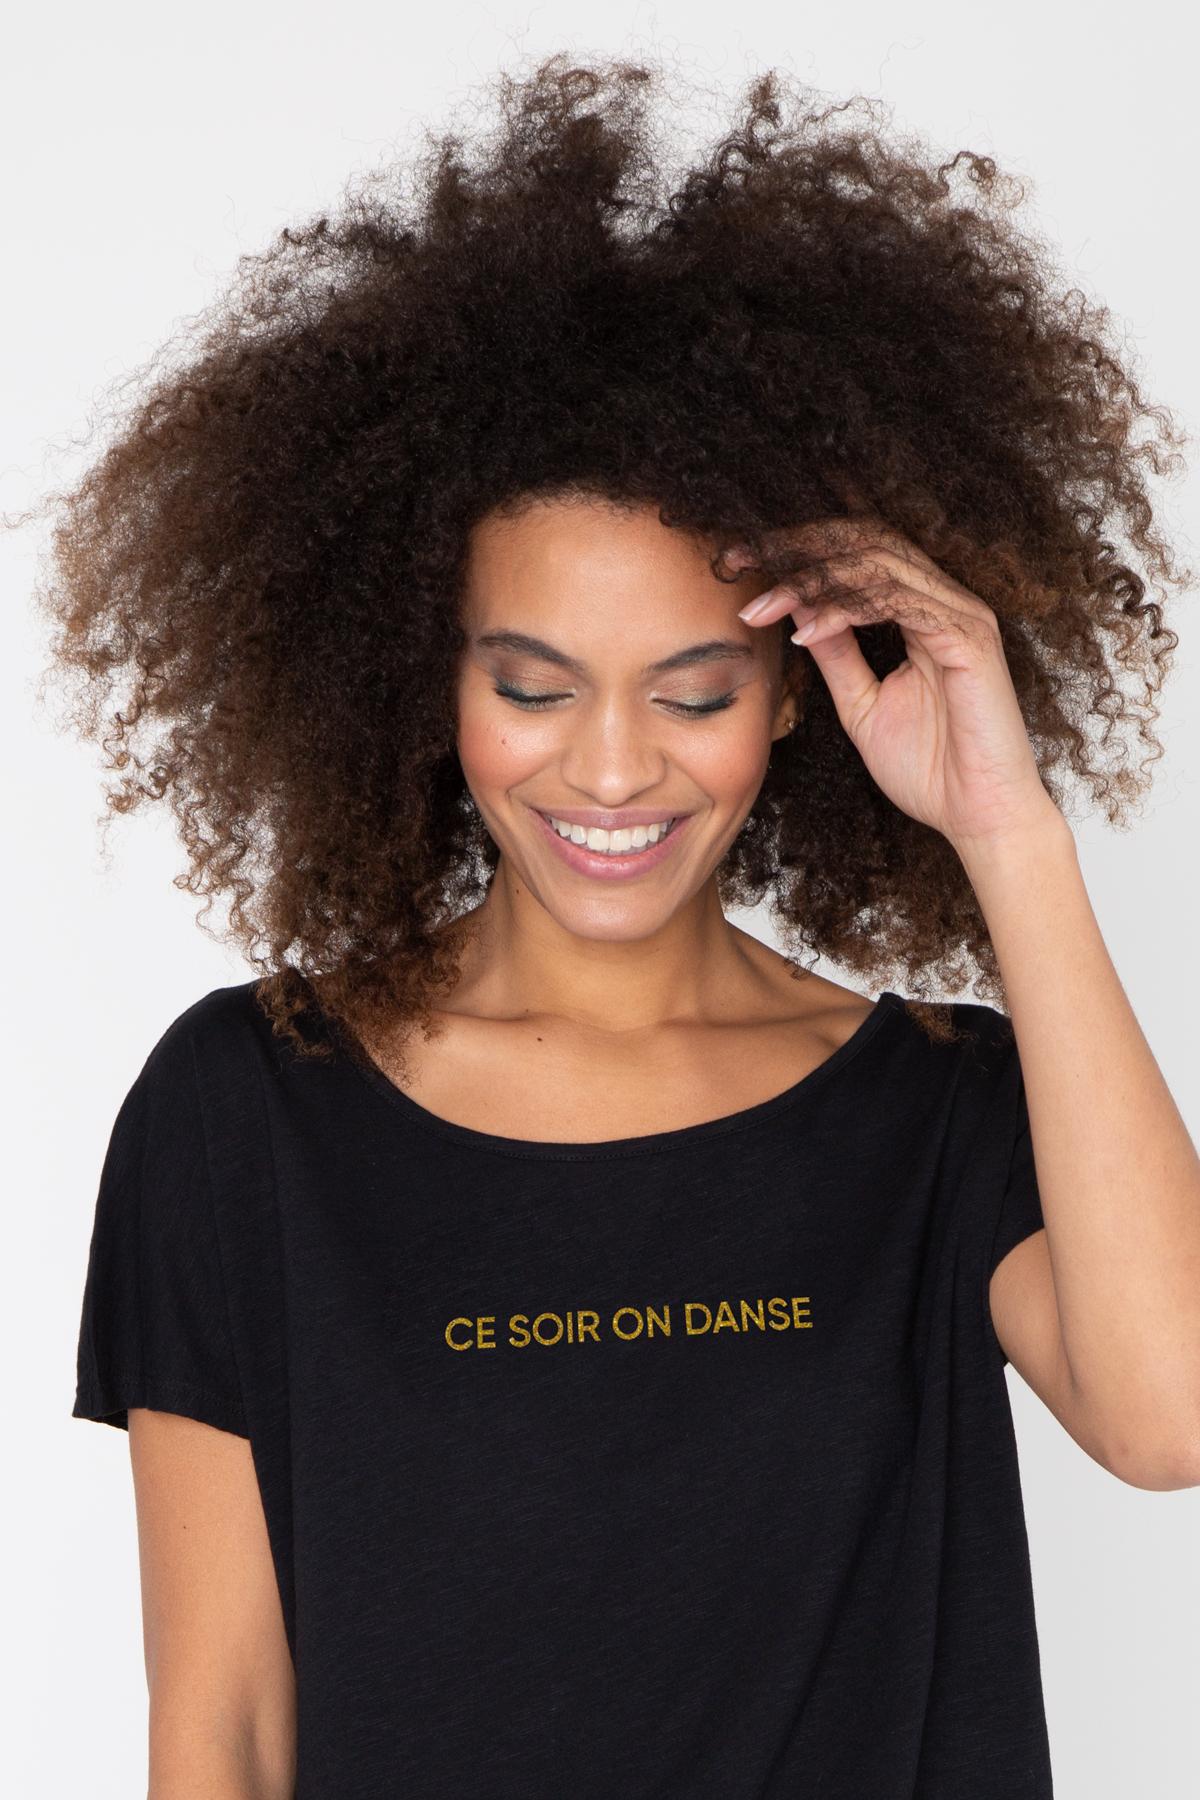 Photo de T-SHIRTS FLAMMÉS Tshirt flammé CE SOIR ON DANSE chez French Disorder